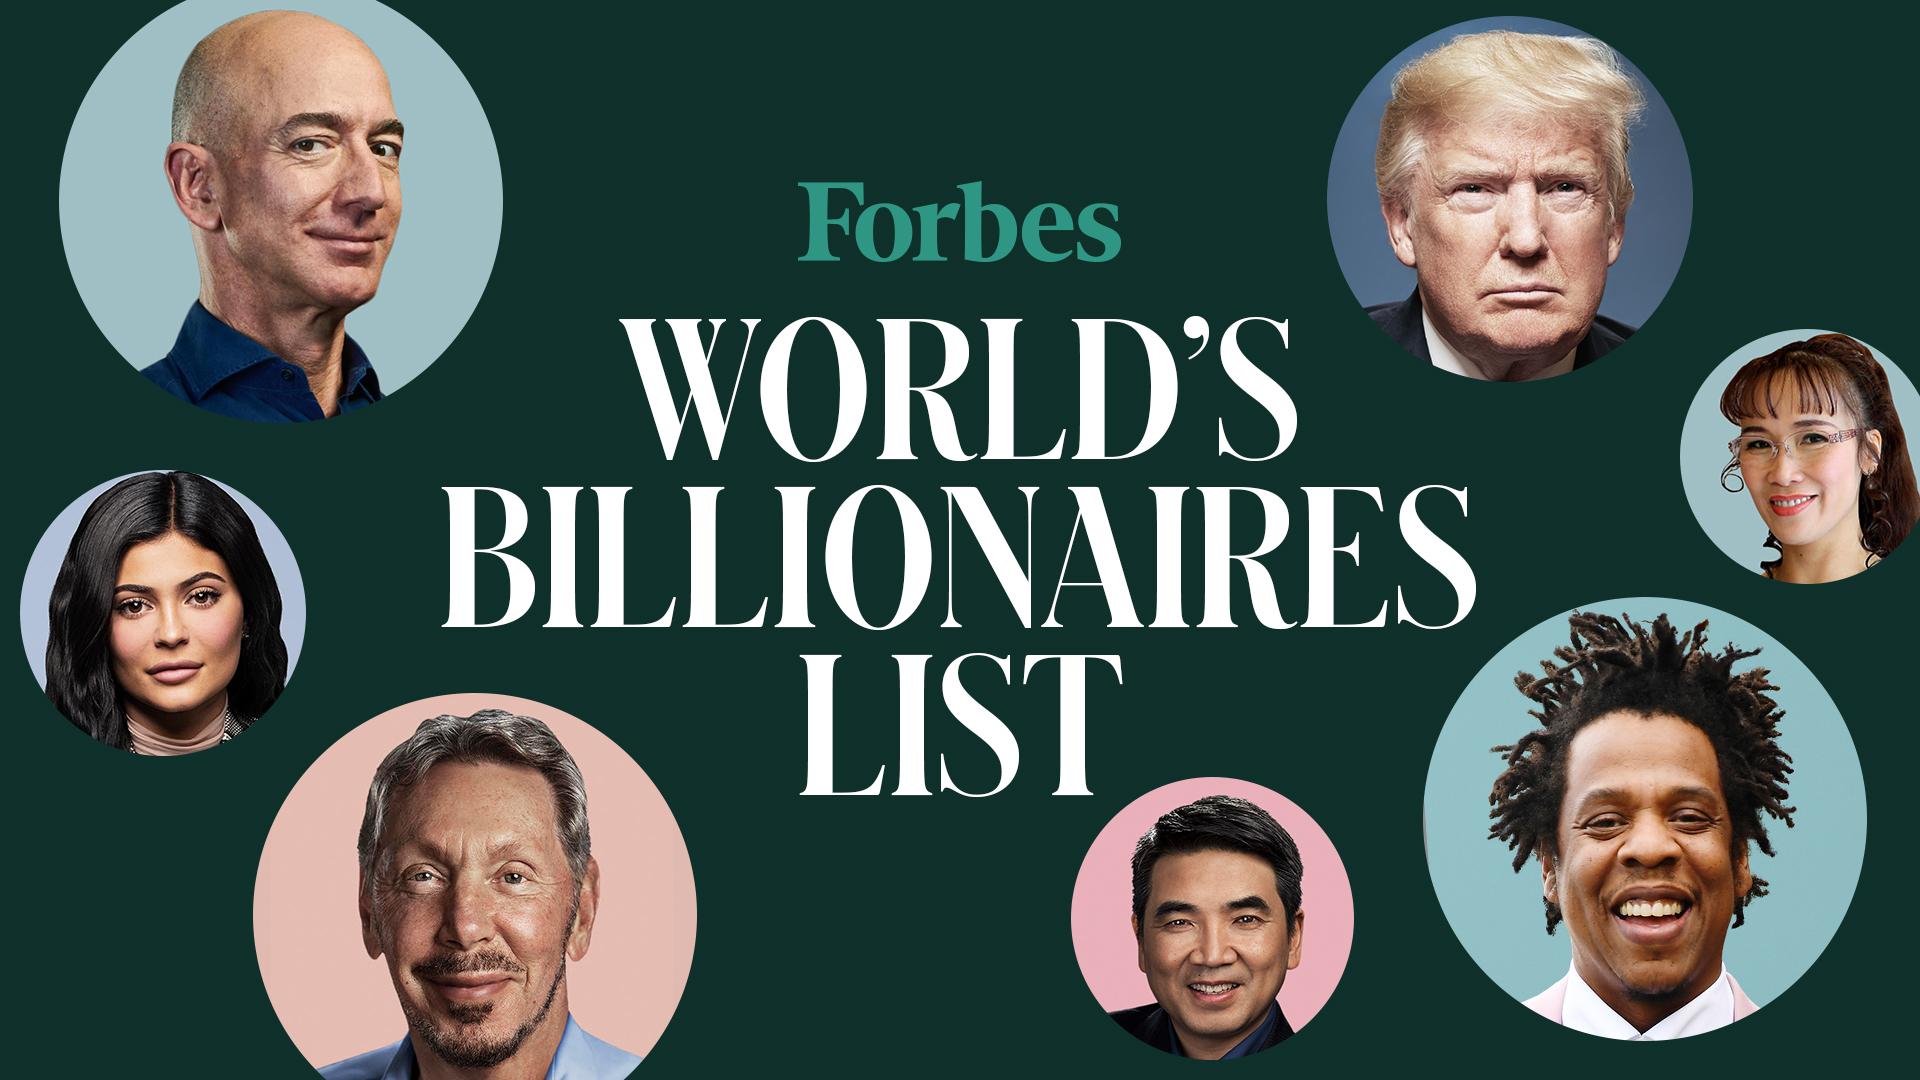 Forbes Billionaires 2020